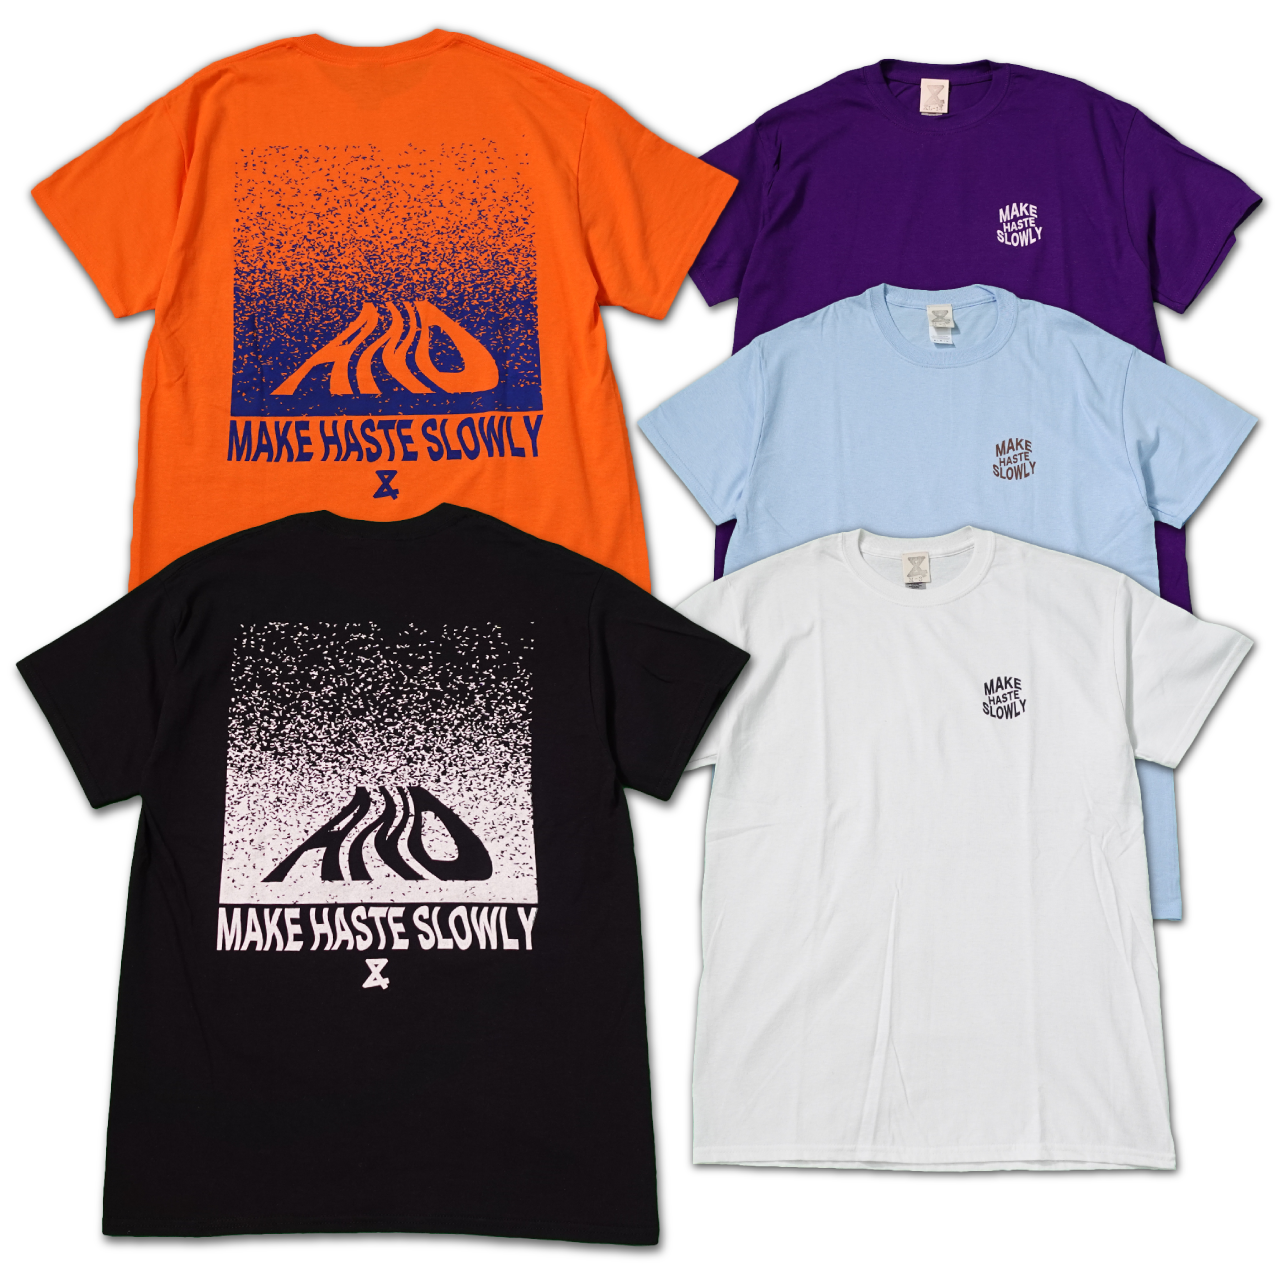 MAKE HASTE SLOWLY Tshirts